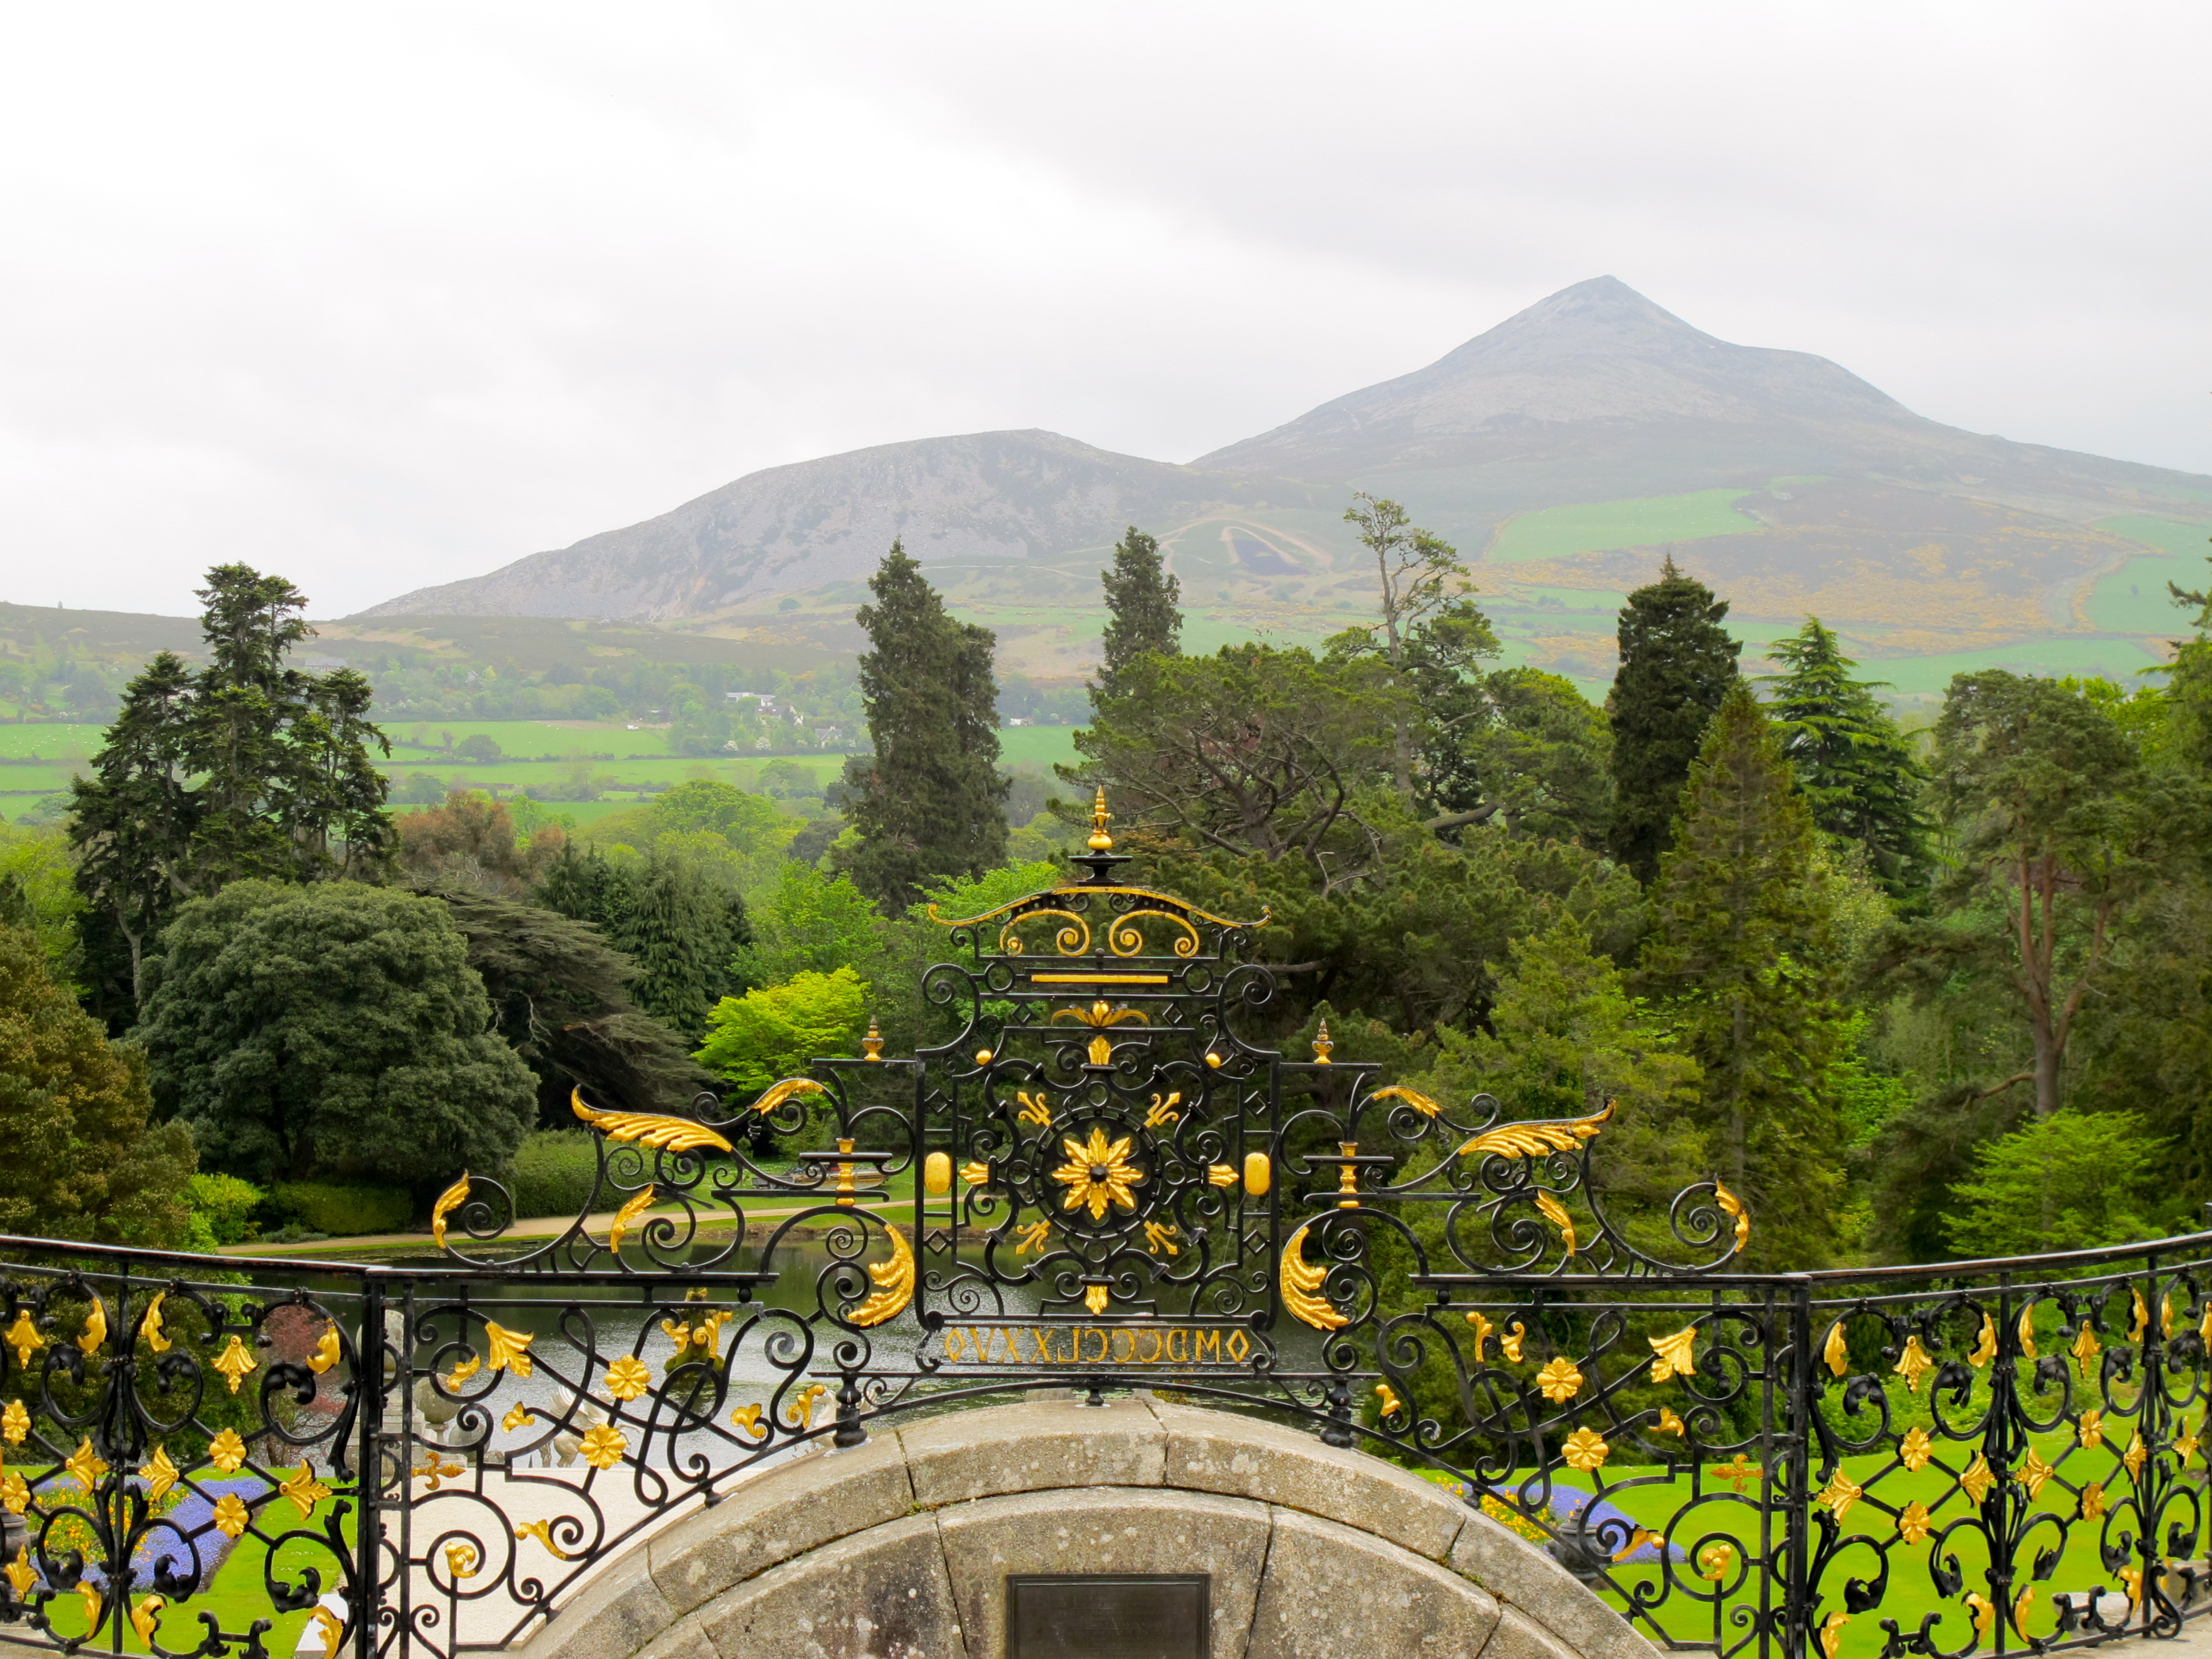 Powerscourt Estate And Gardens Irish Manor Houses Rhododendrons Revelation 21 3 7 Summer